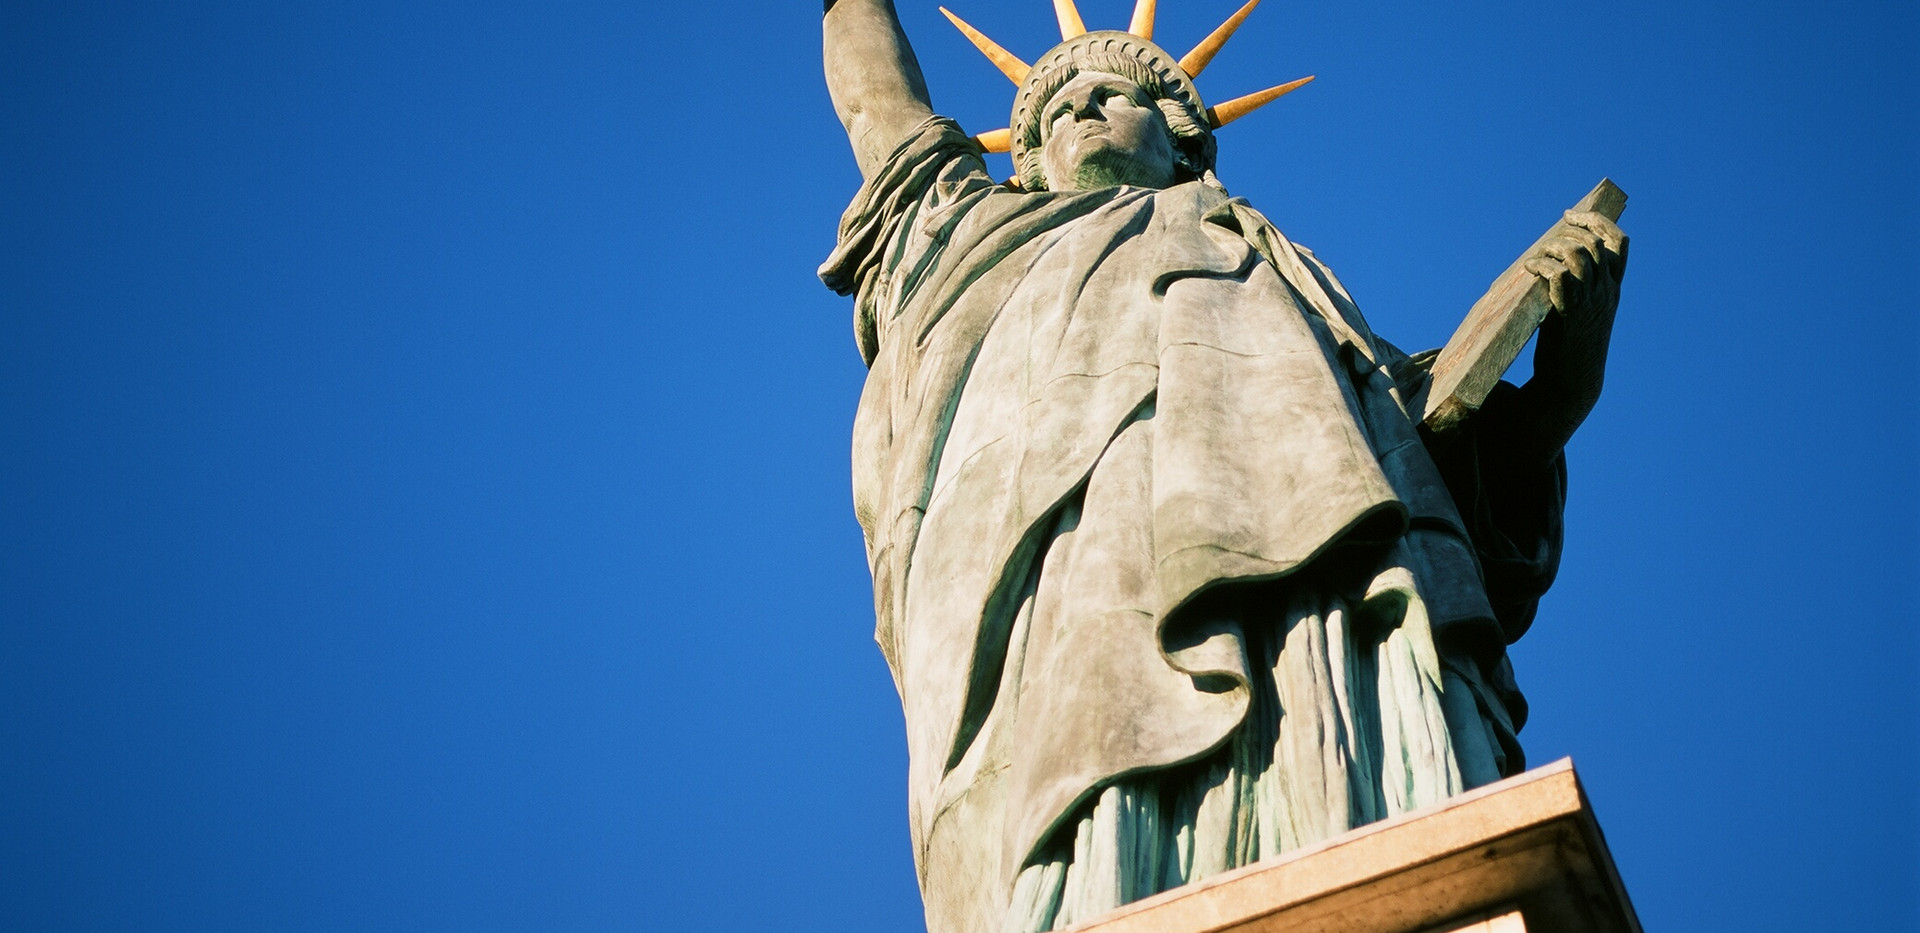 My Liberty